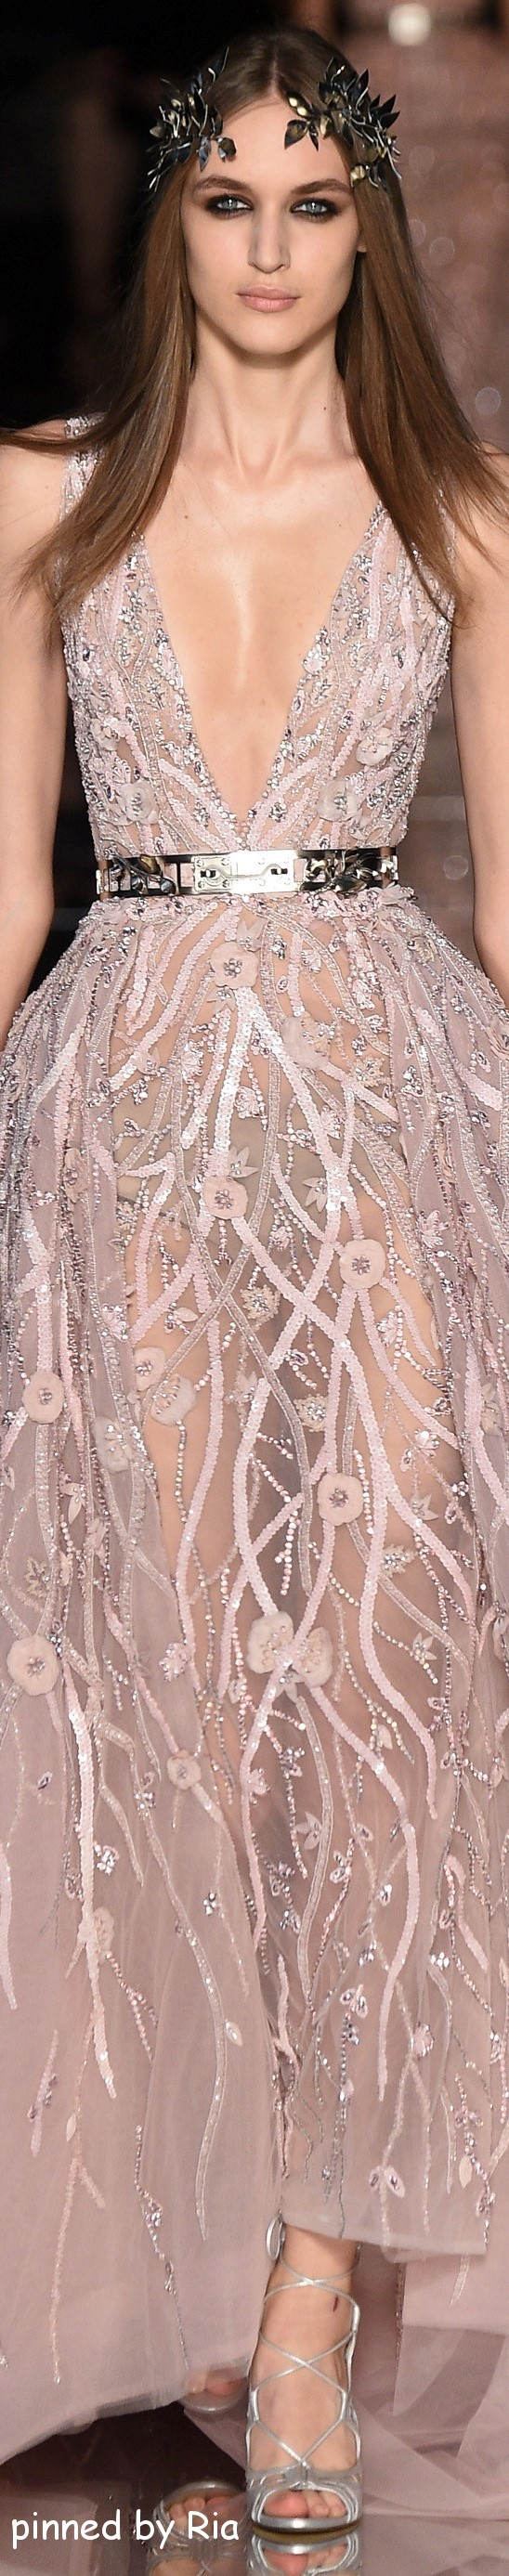 Zurhair Murad Spring 2016 Couture l Ria | Haute Couture | Pinterest ...